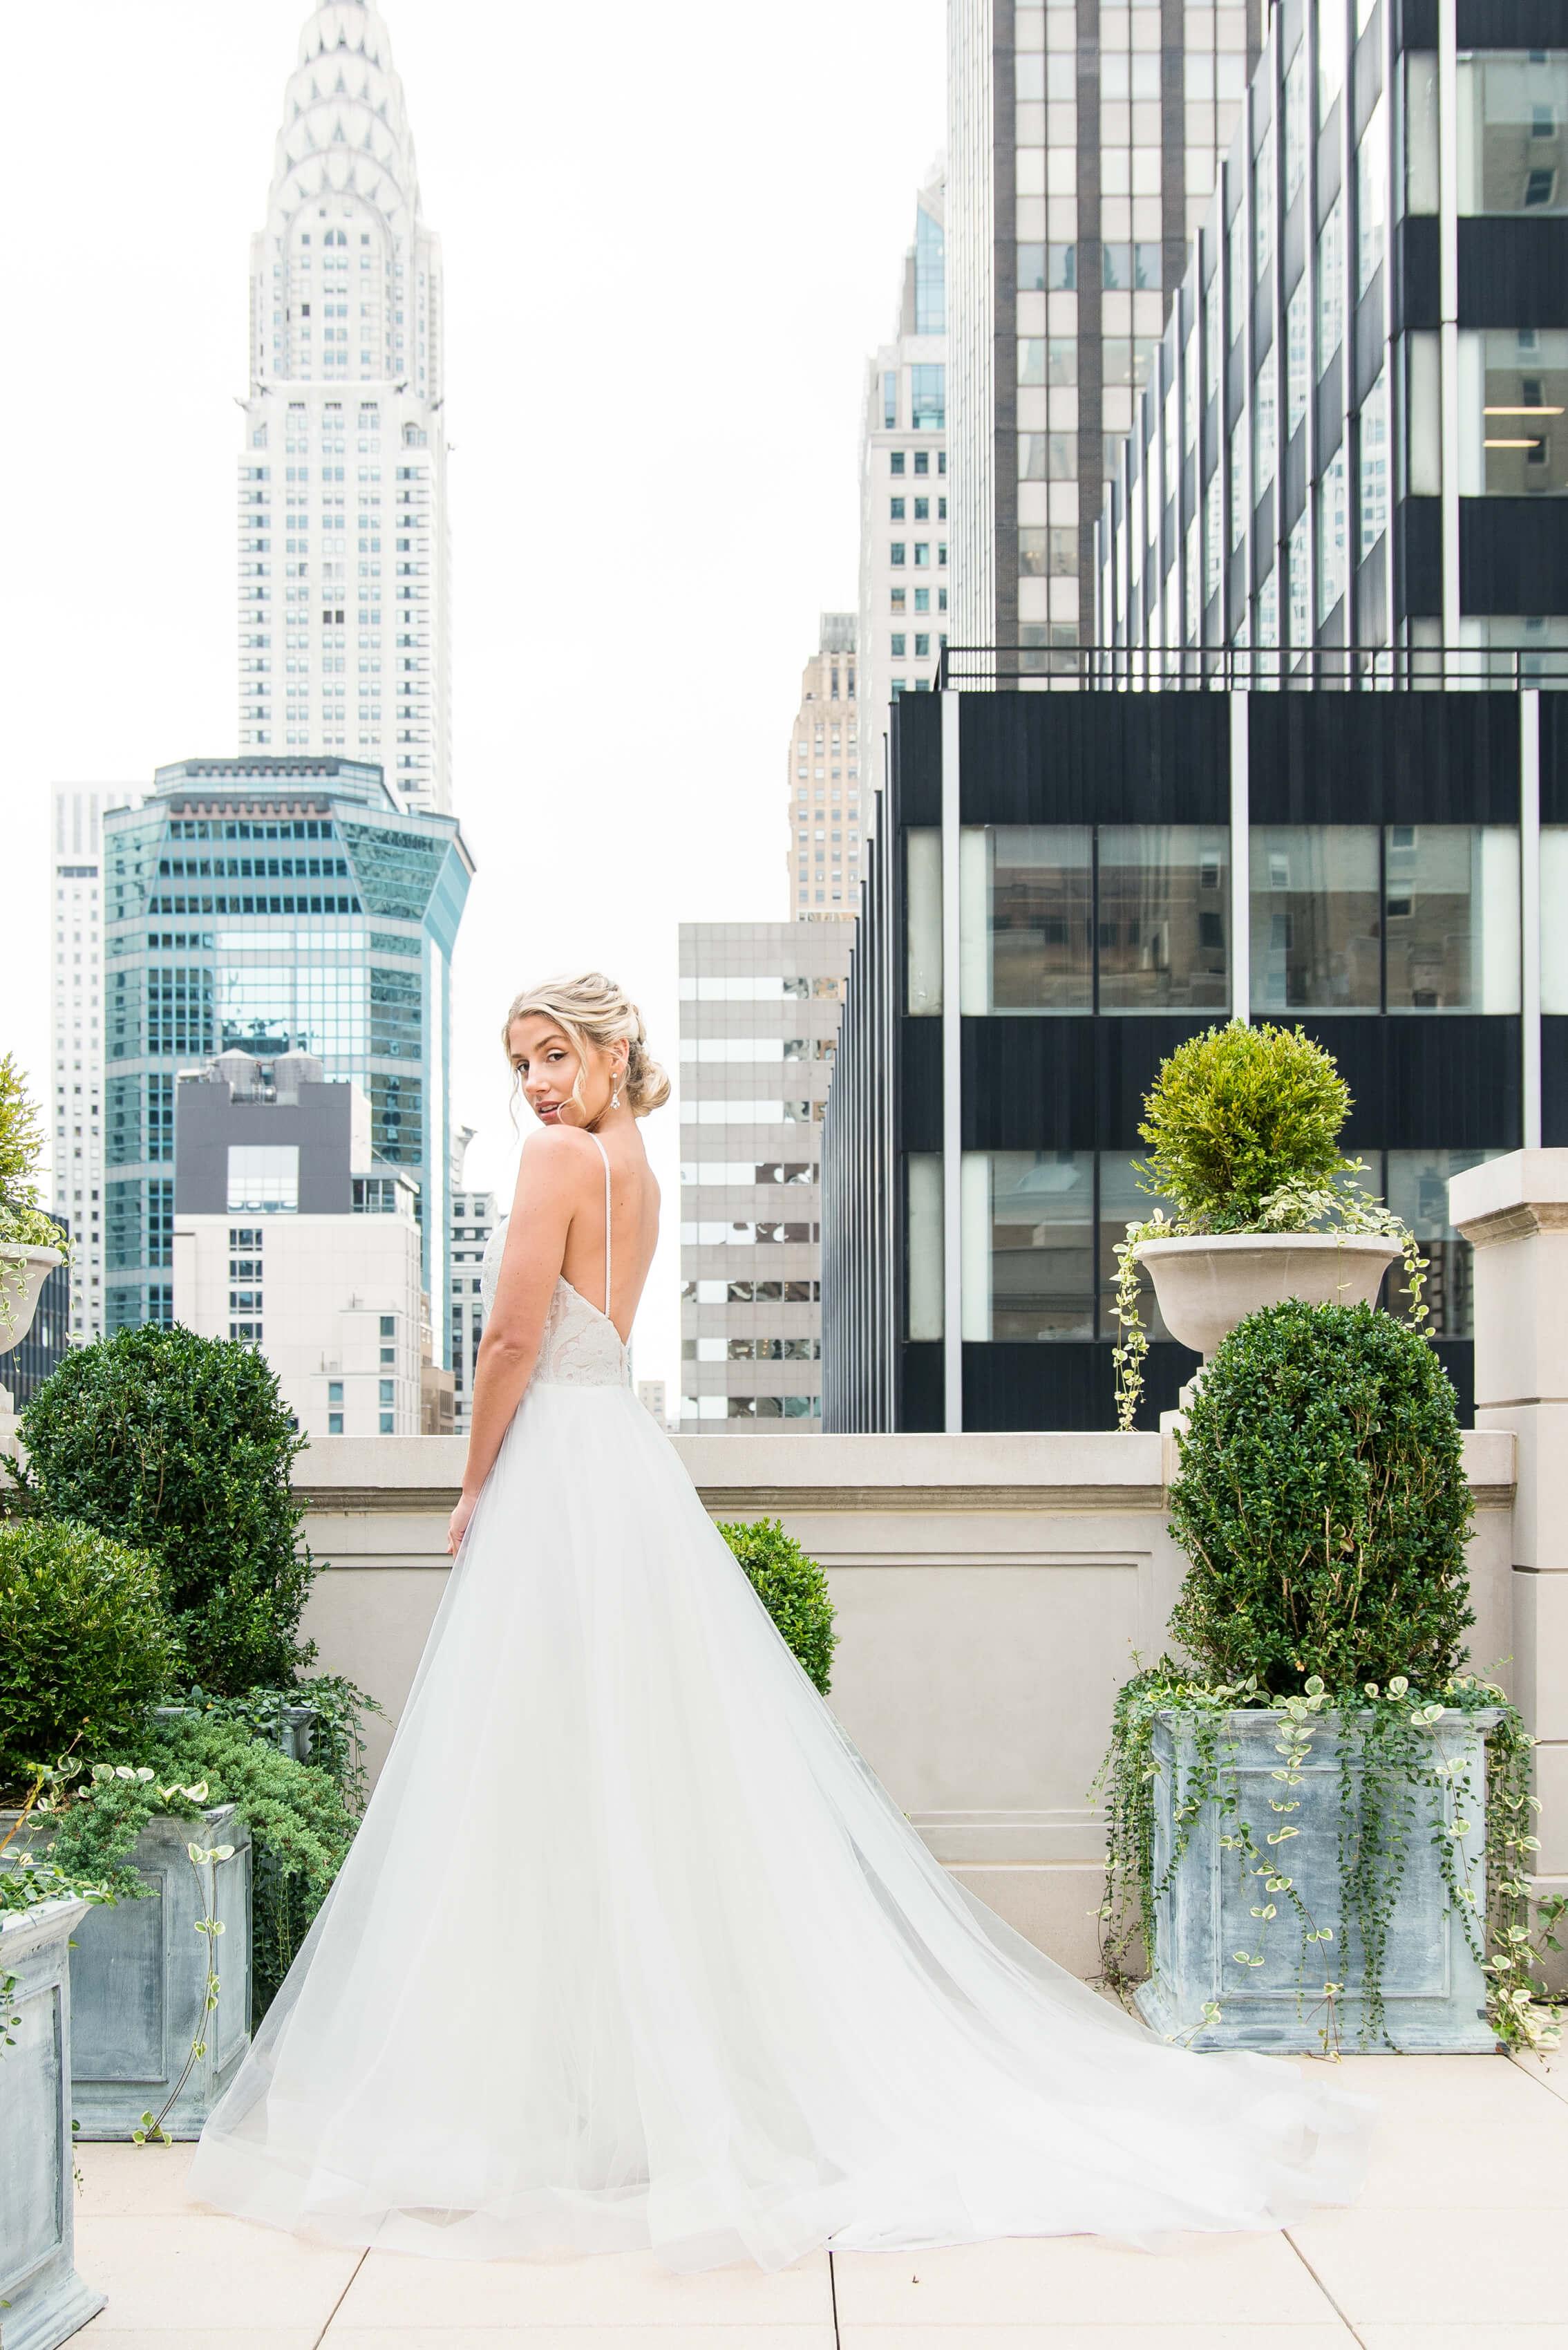 jack sullivan bride jacksonville florida city wedding dress ball gown